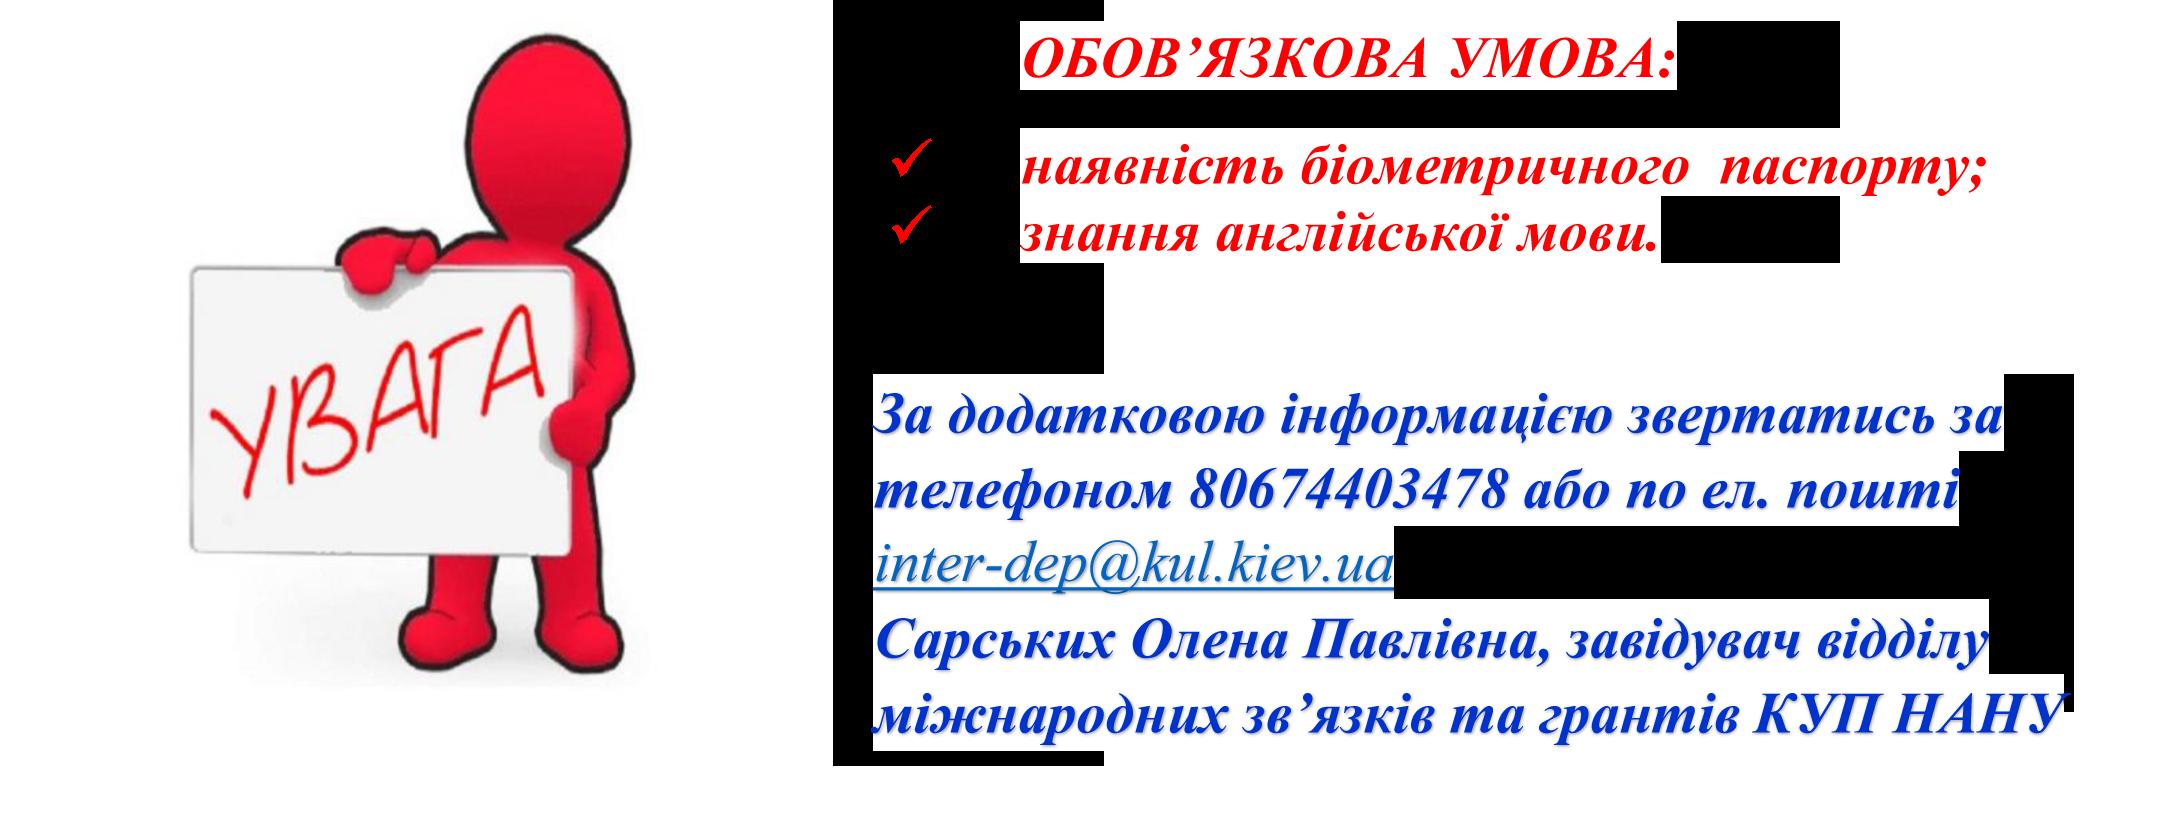 dsc_4590.jpg